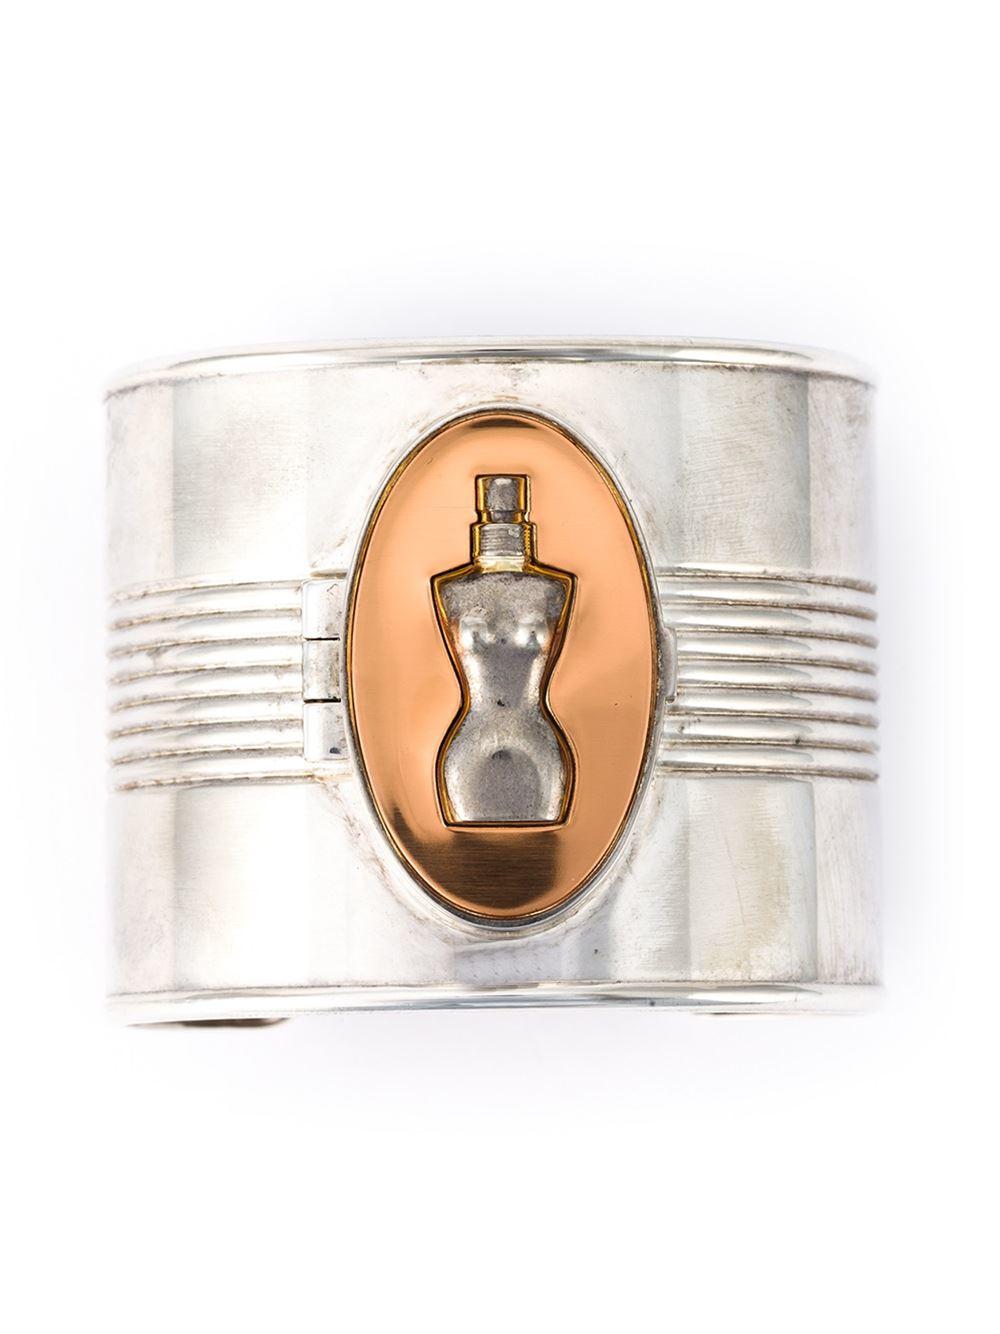 jean paul gaultier classic perfume cuff in silver. Black Bedroom Furniture Sets. Home Design Ideas